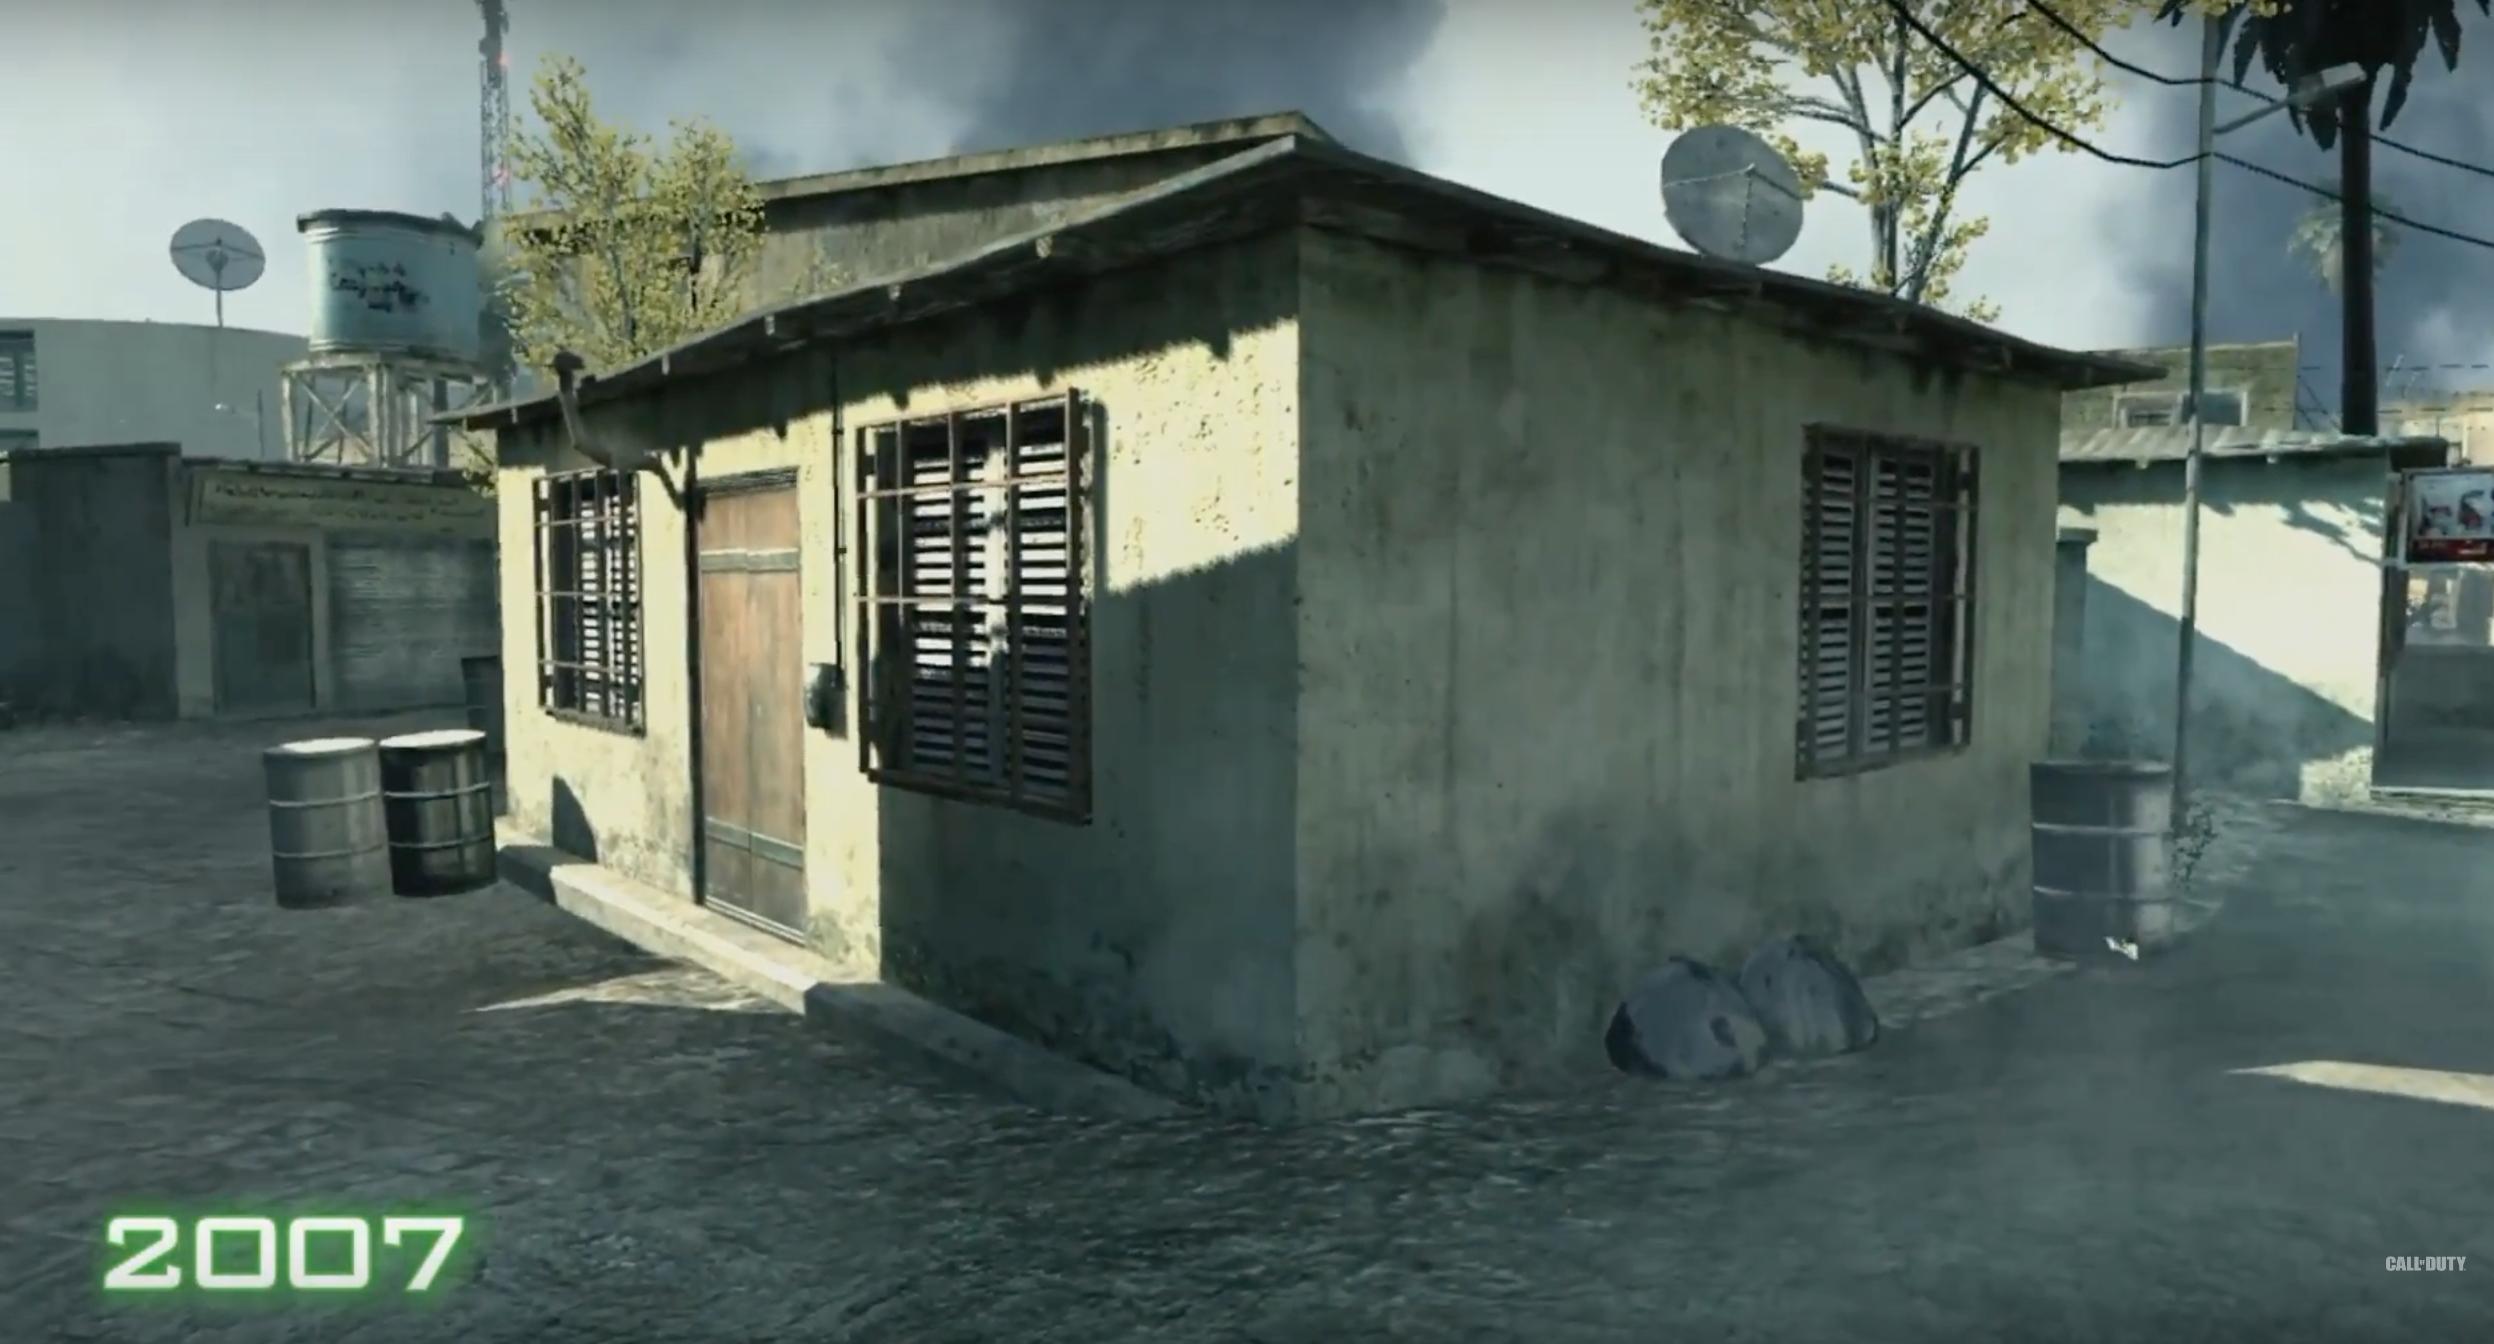 Call of Duty: Modern Warfare Remastered screens show how far